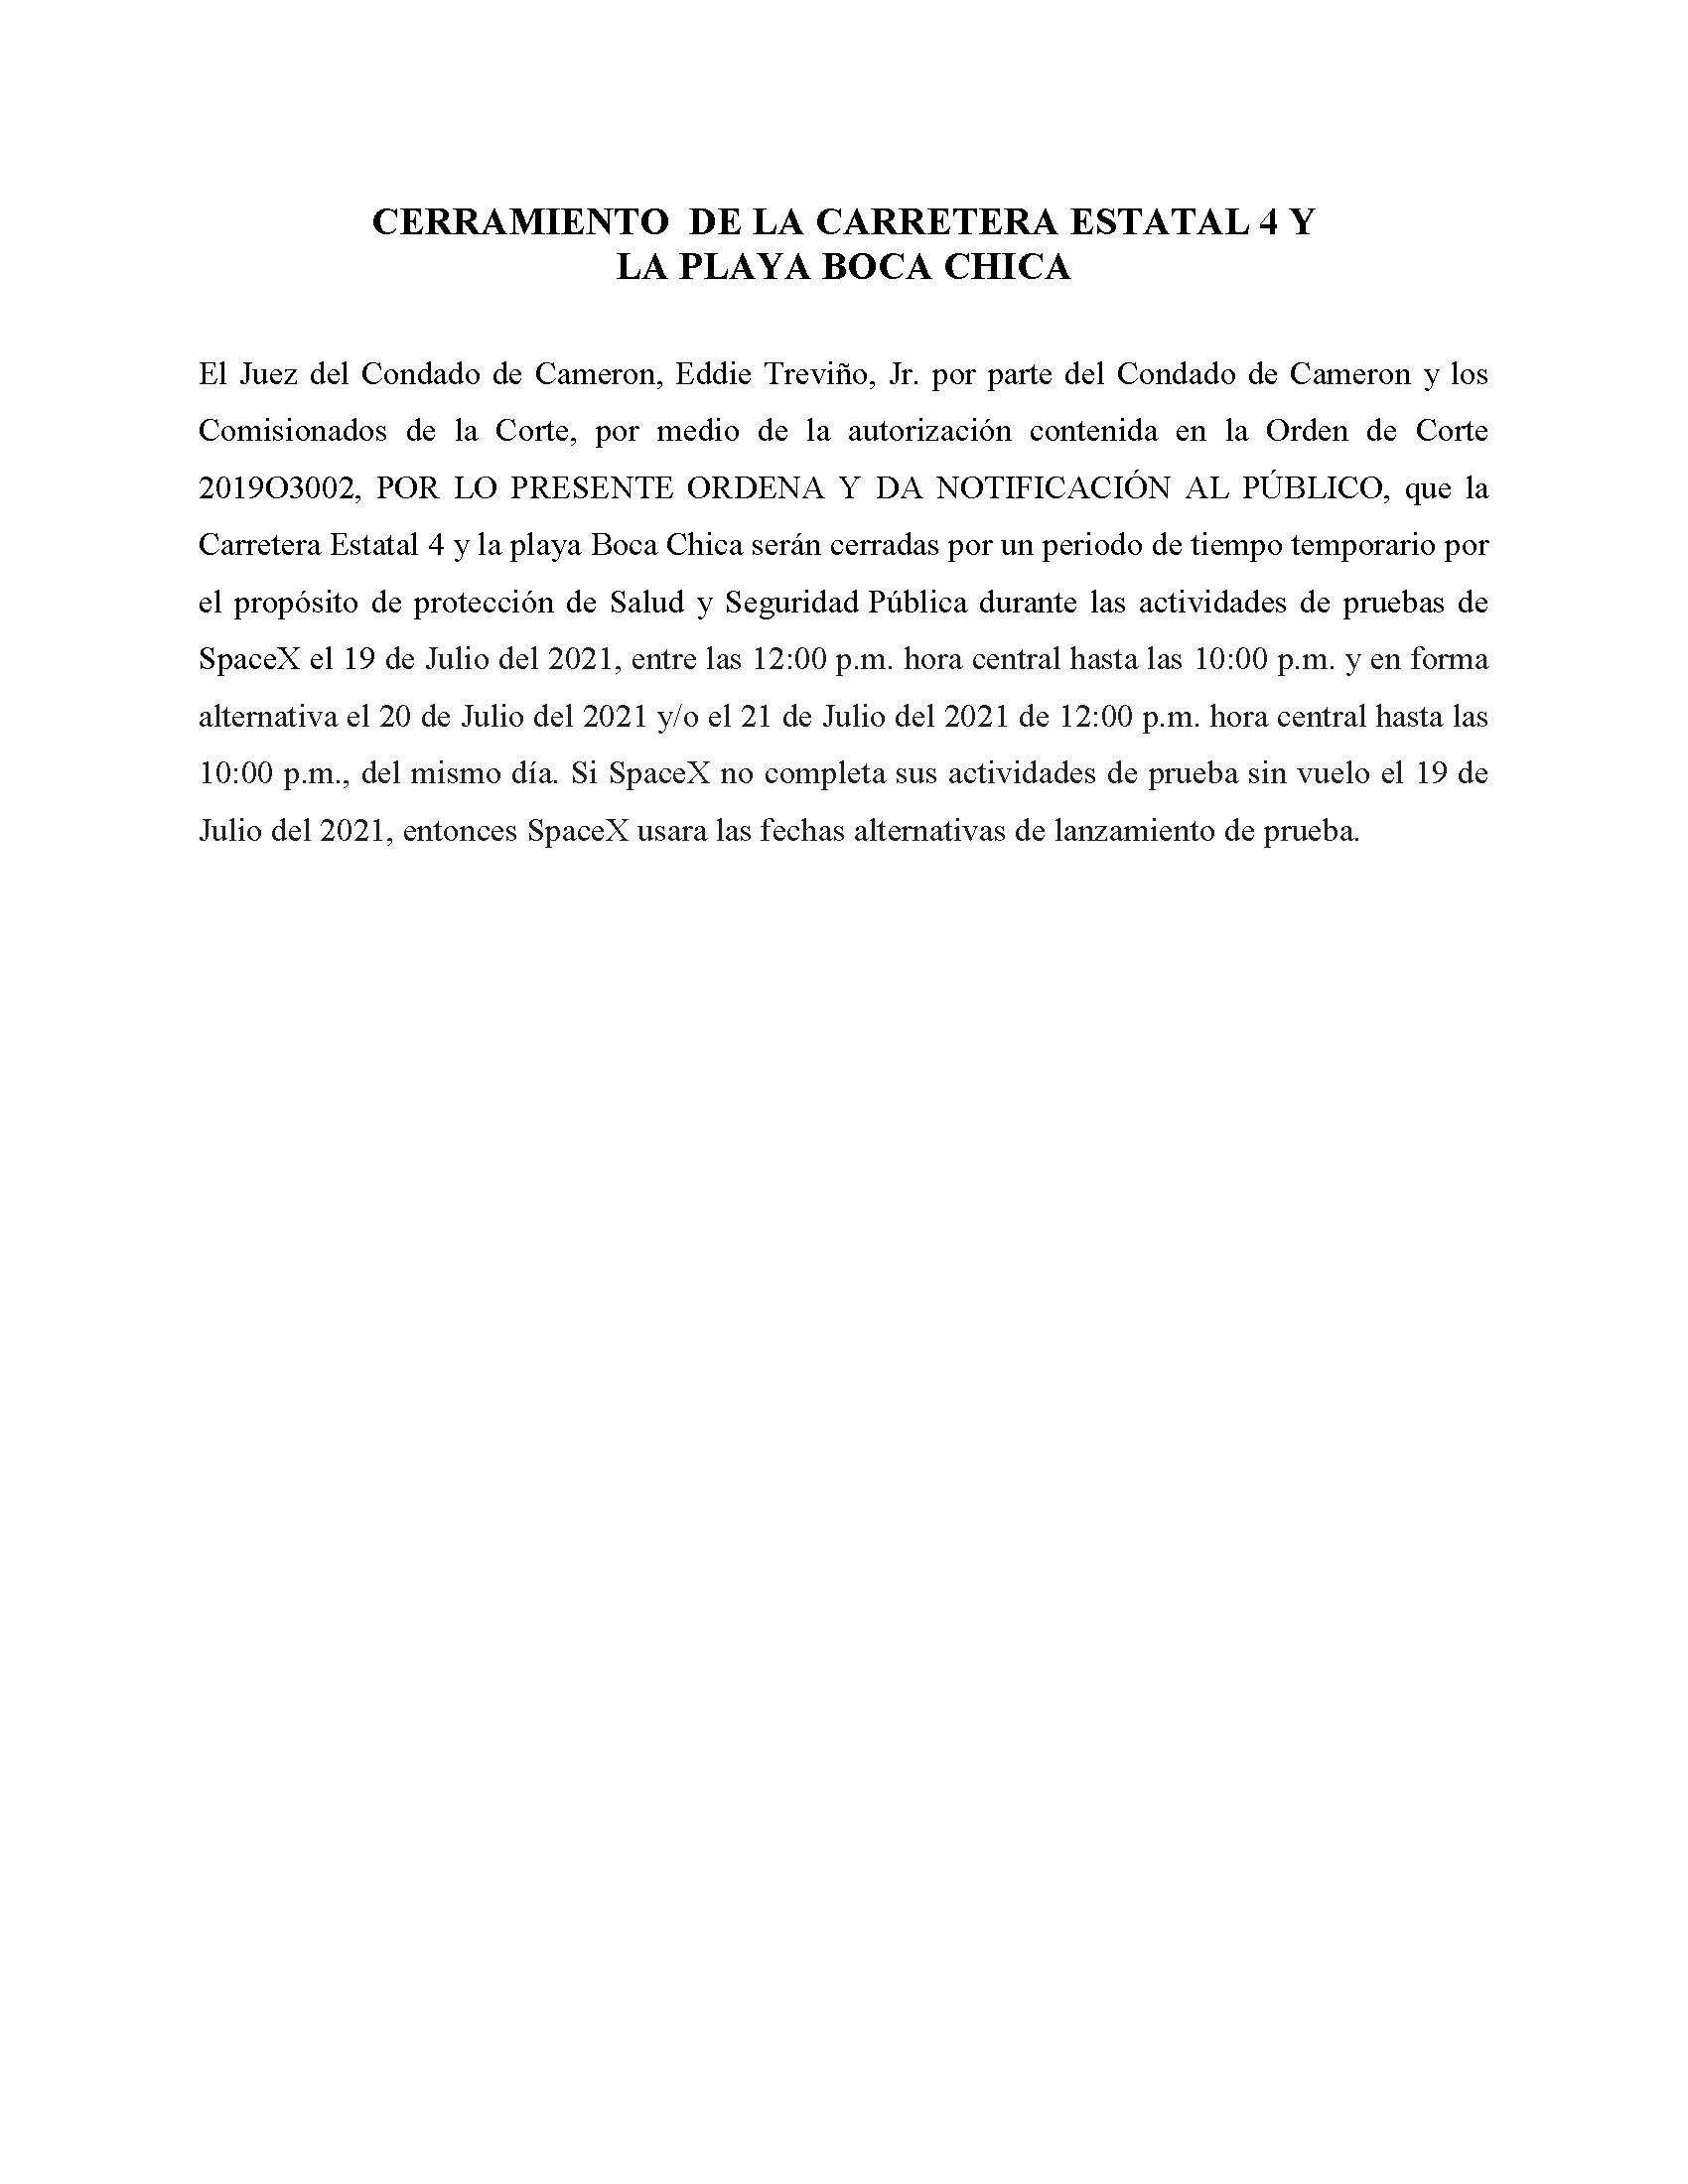 ORDER.CLOSURE OF HIGHWAY 4 Y LA PLAYA BOCA CHICA.SPANISH.07.19.2021